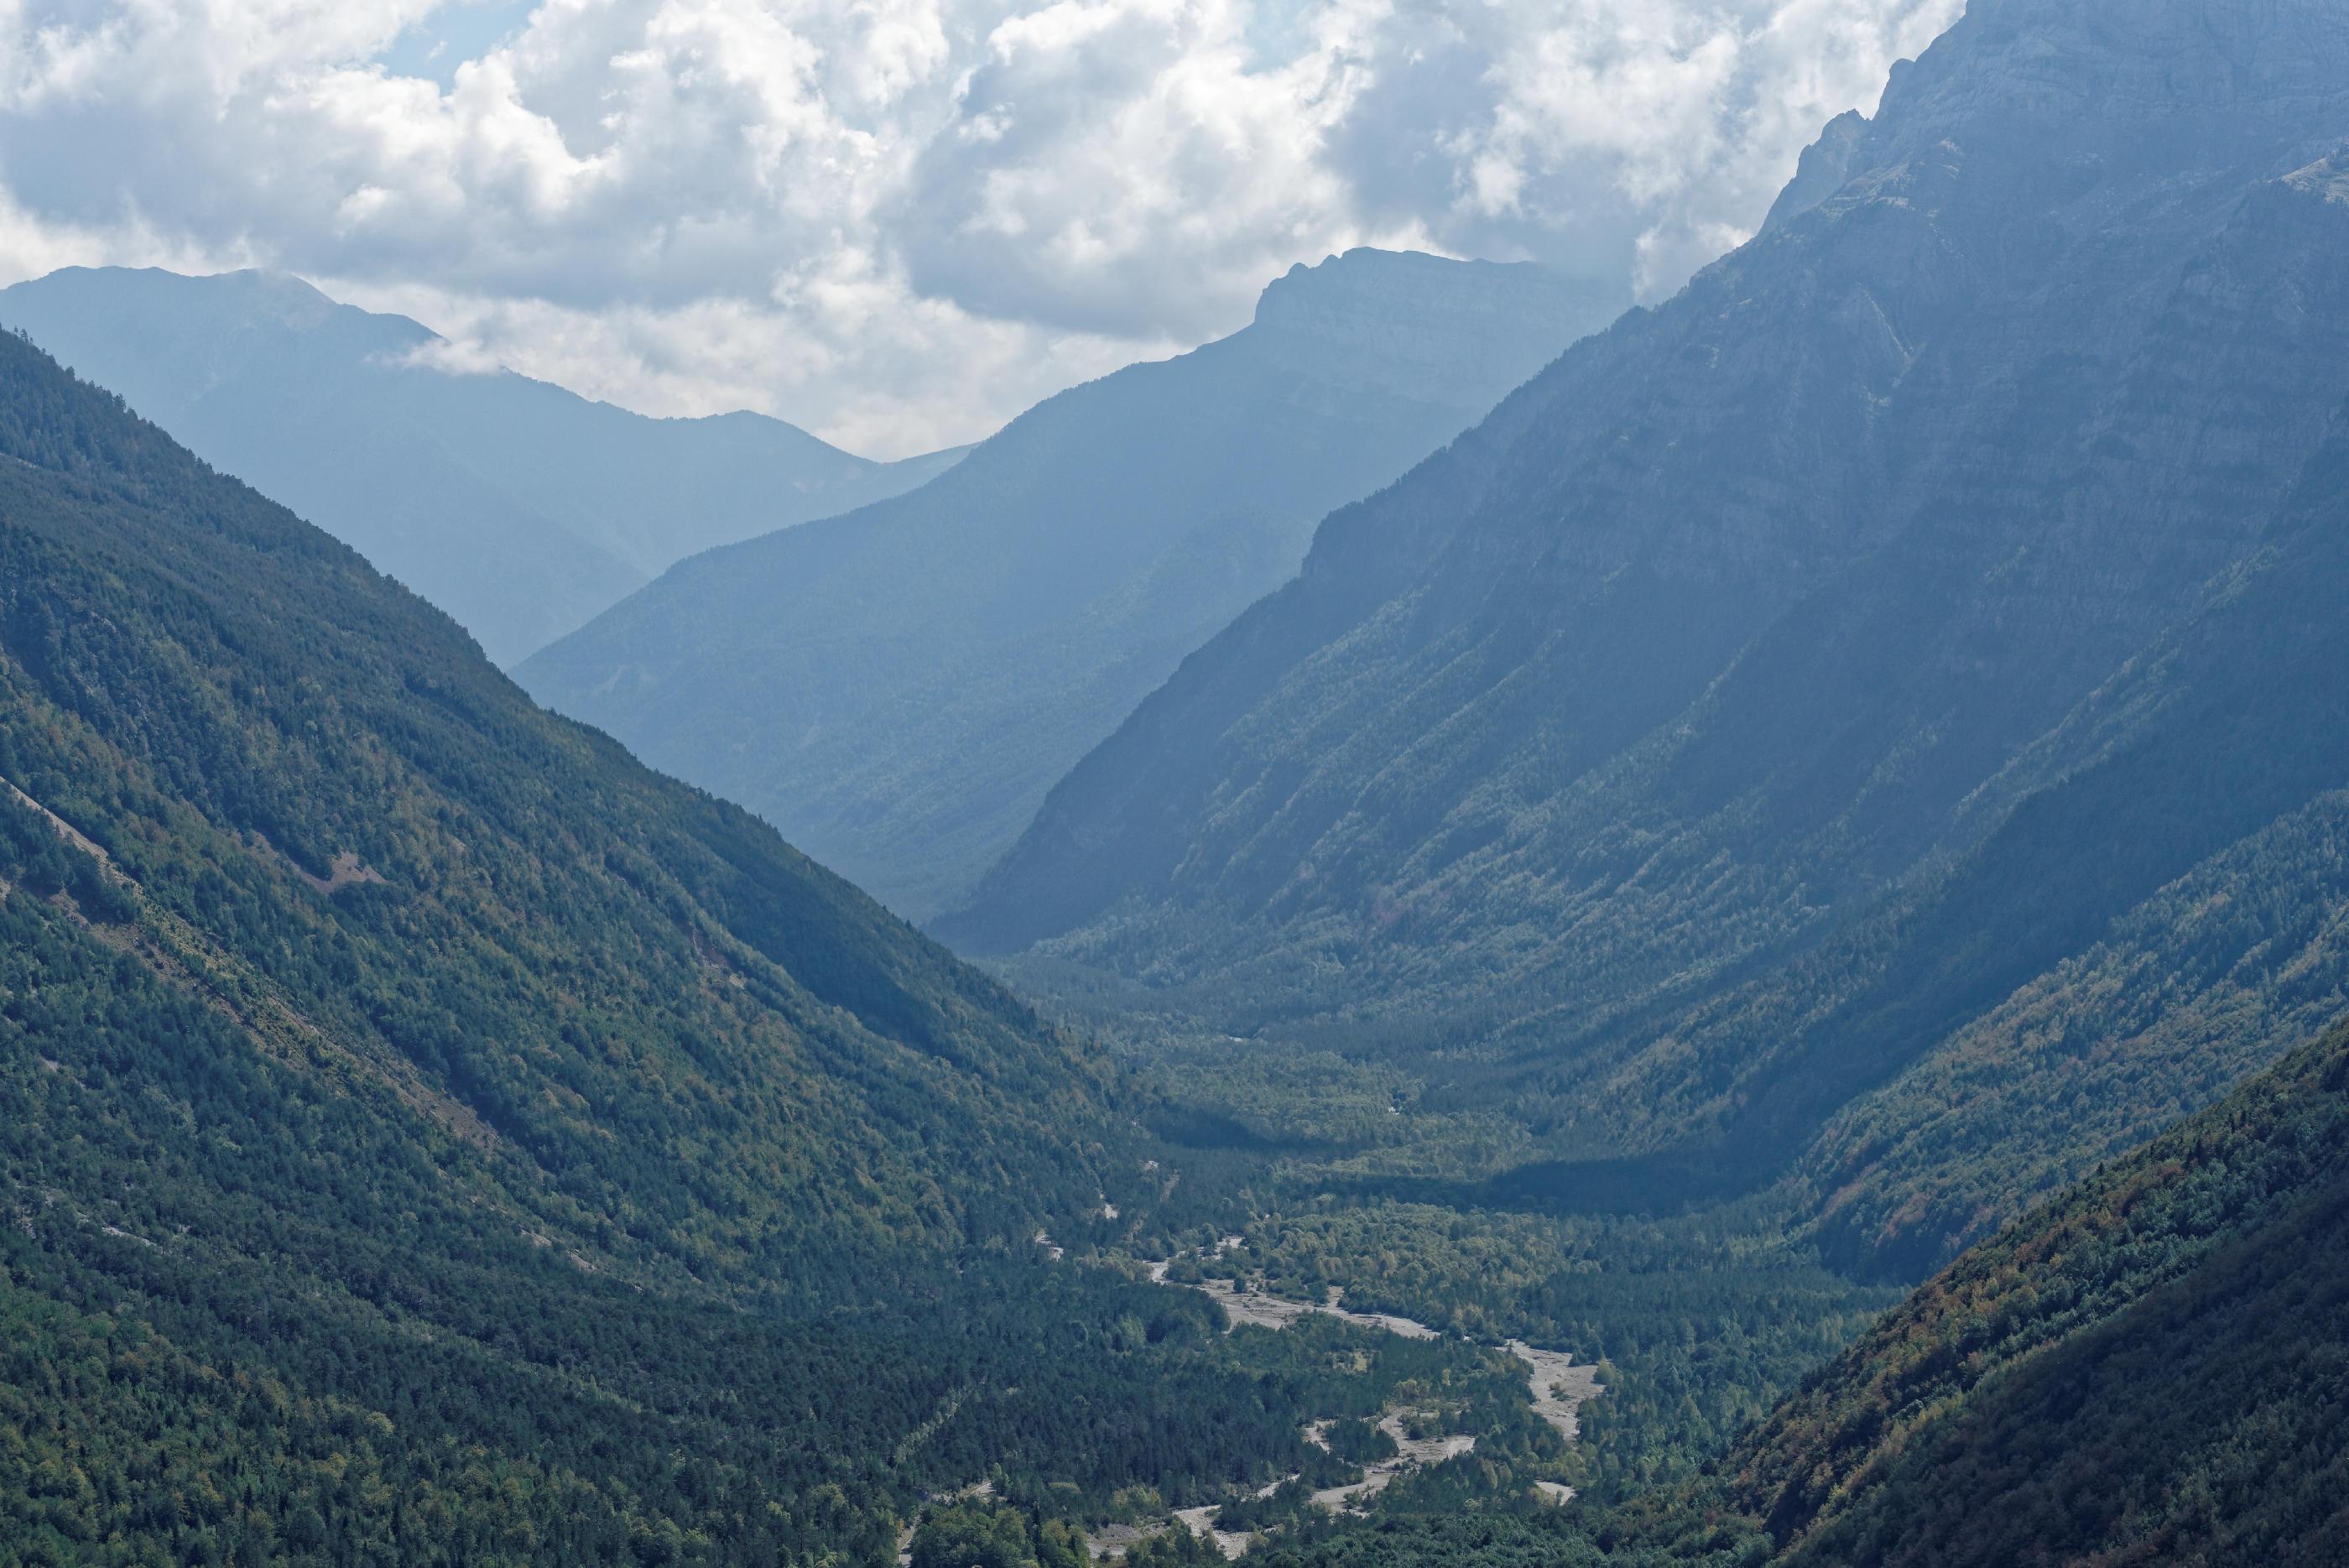 160910-marche-cascade-du-cinca-et-de-la-larri-sobrarbe-aragon-138